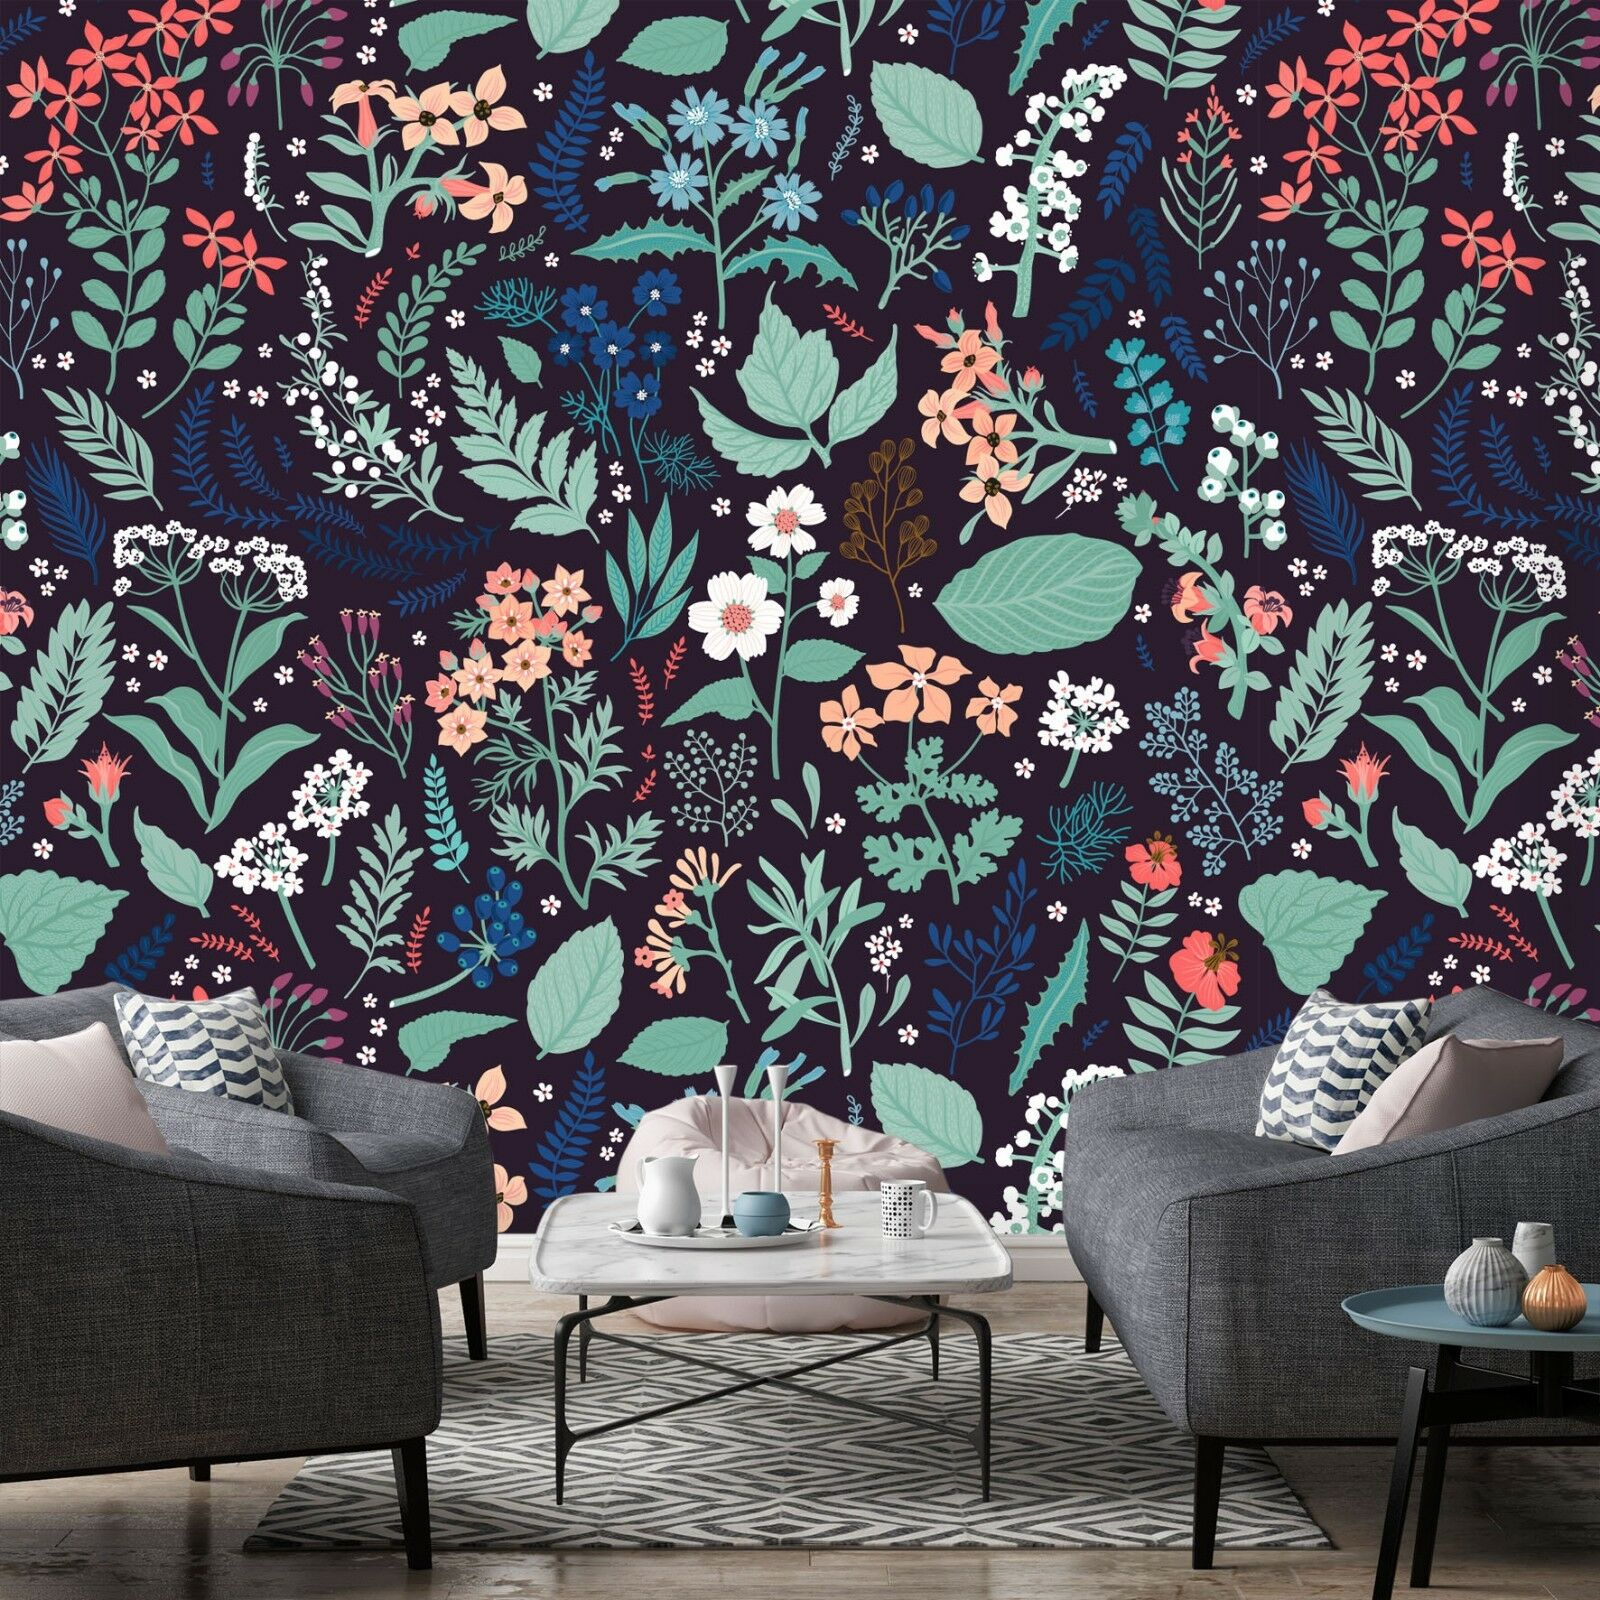 3D Grass Flower rot 7028 Wall Paper Print Wall Decal Deco Indoor Wall Murals US